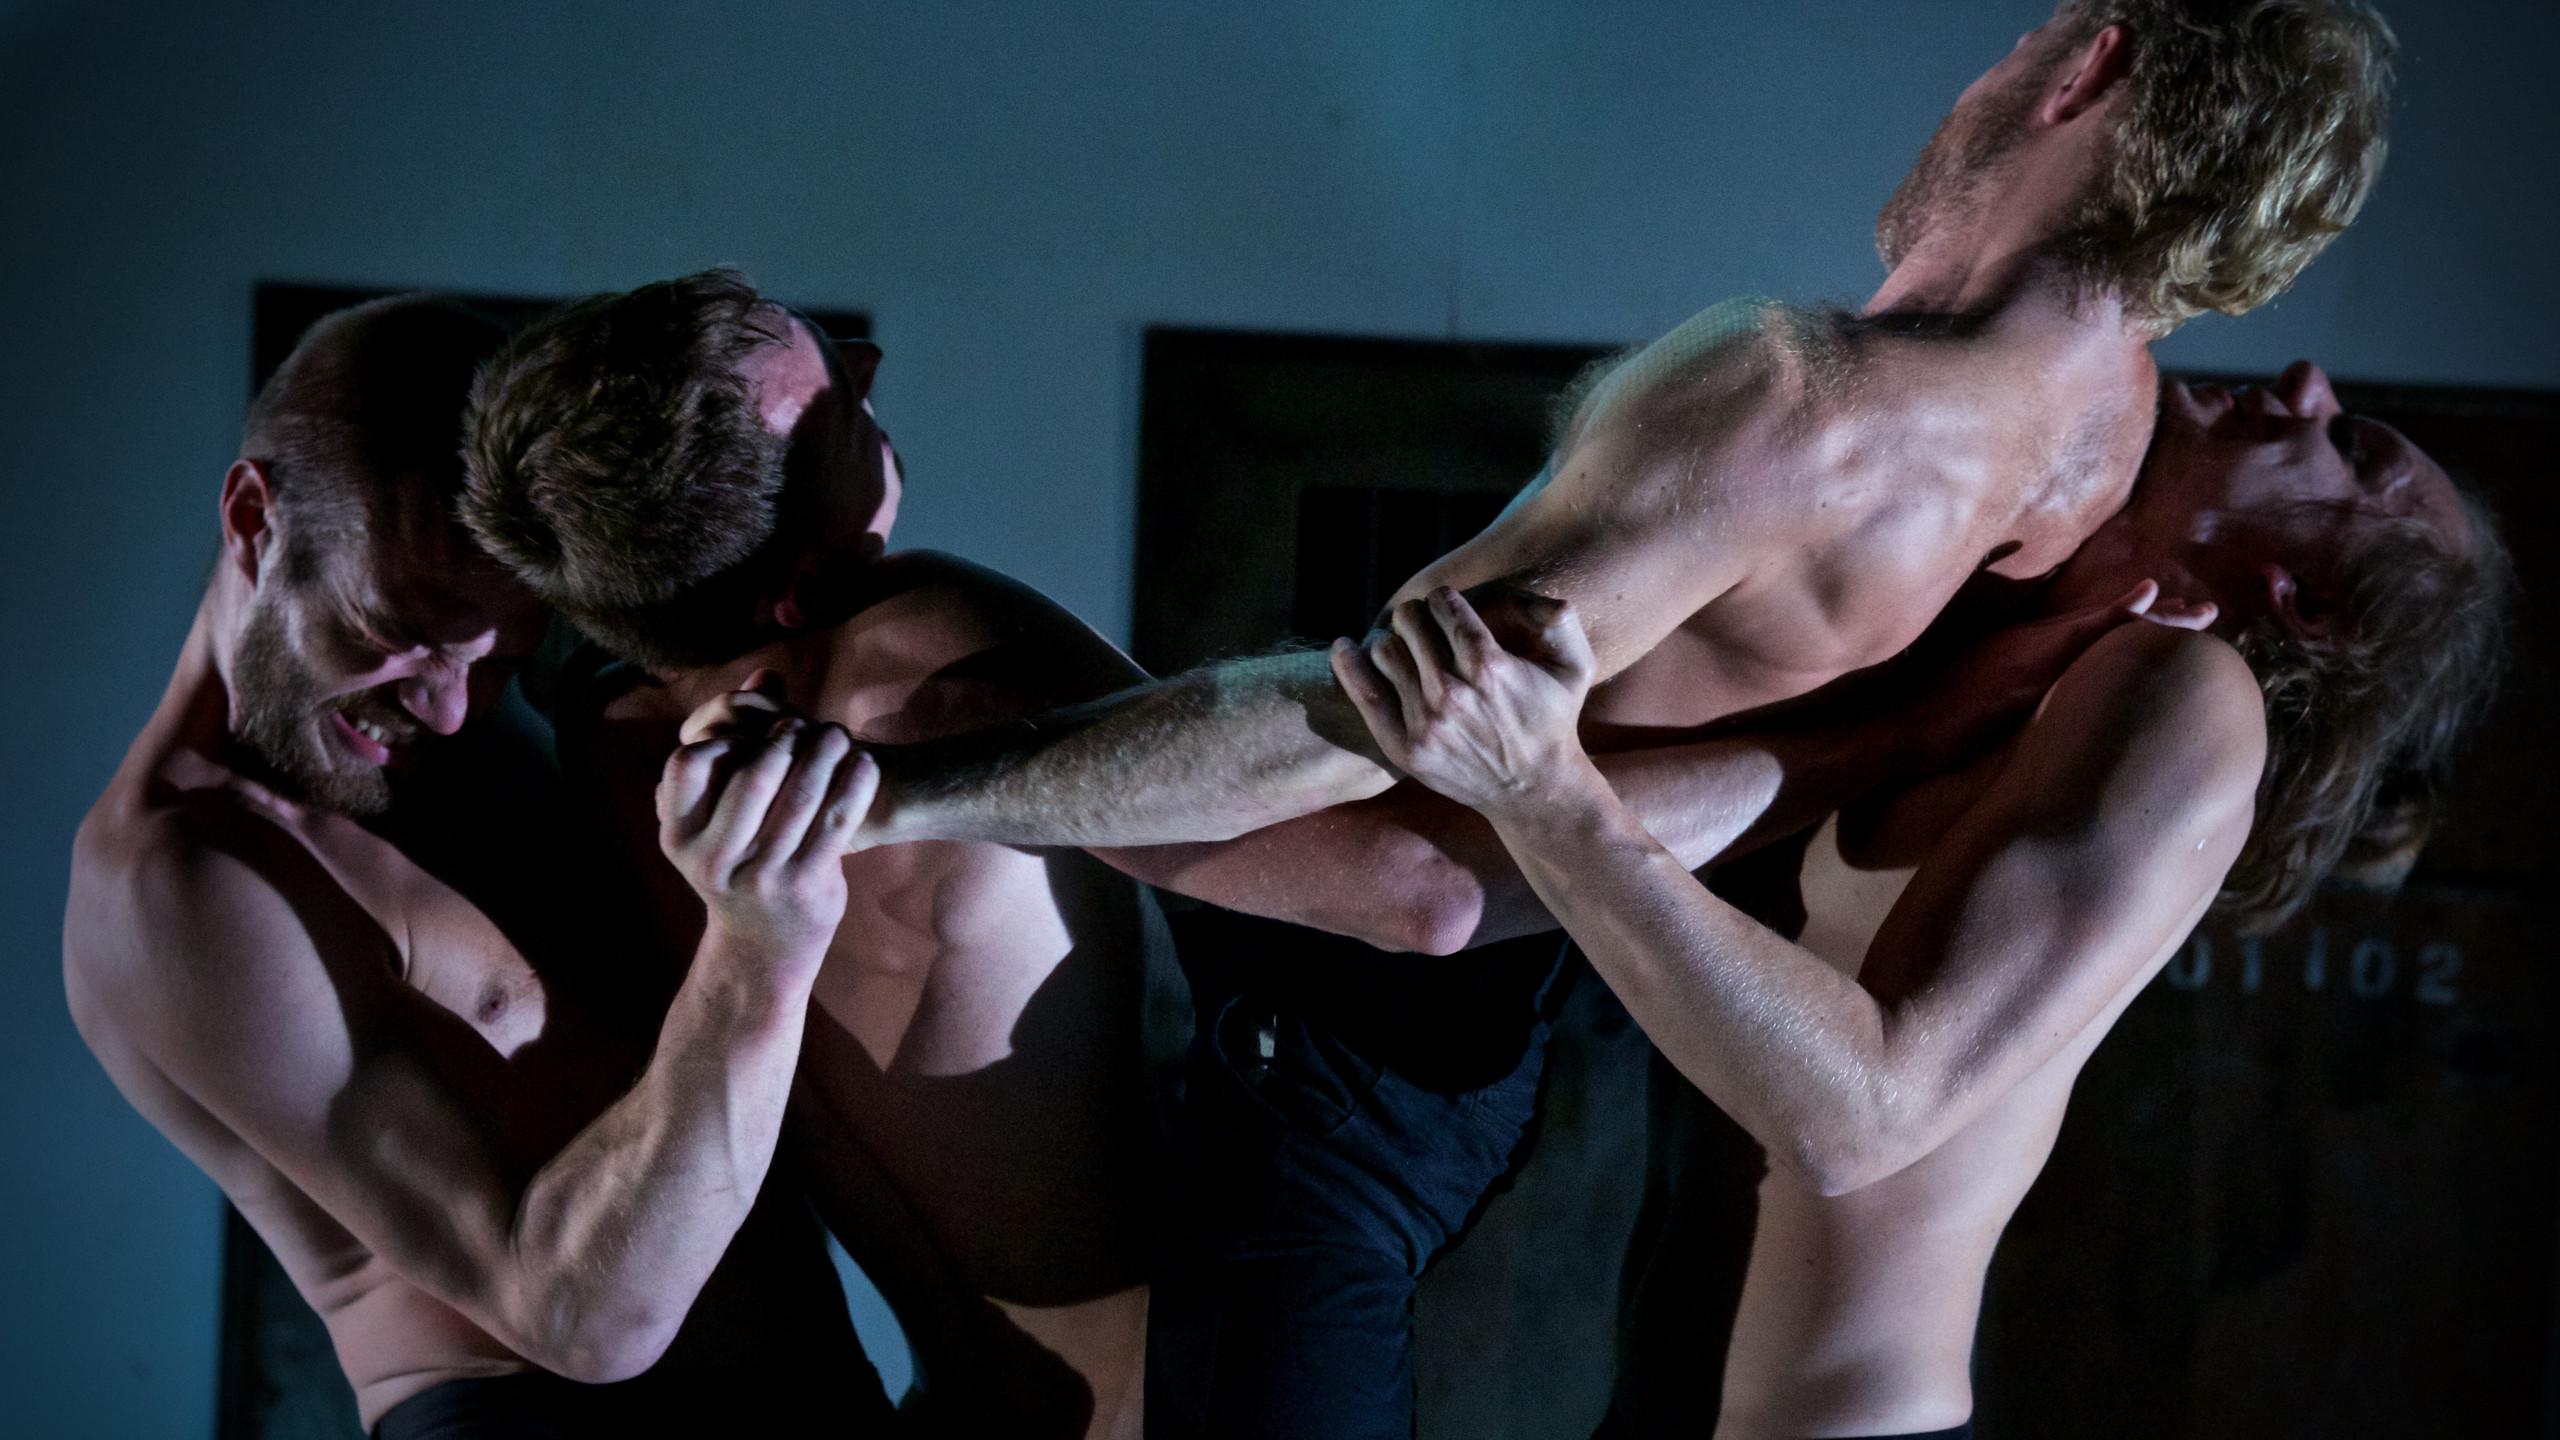 (c) Nicolai Khalezin, Belarus Free Theatre - Burning Doors. Kiryl Kanstantsinau, Siarhei Kvachonak, Andrei Urazau- and Pavel Haradnitski